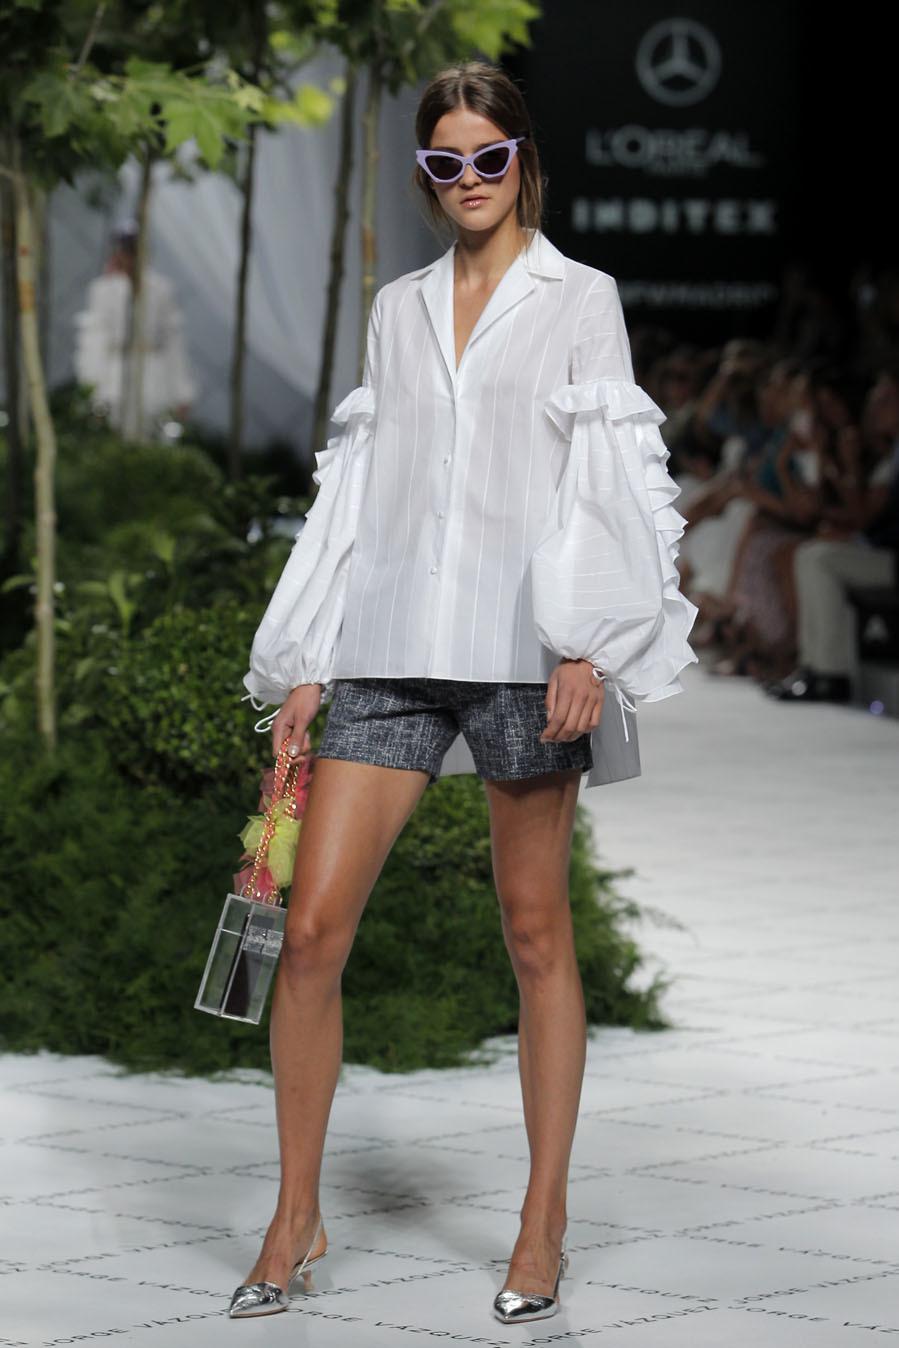 Jorge v zquez spring summer 2019 madrid fashion week - Madrid chic style ...